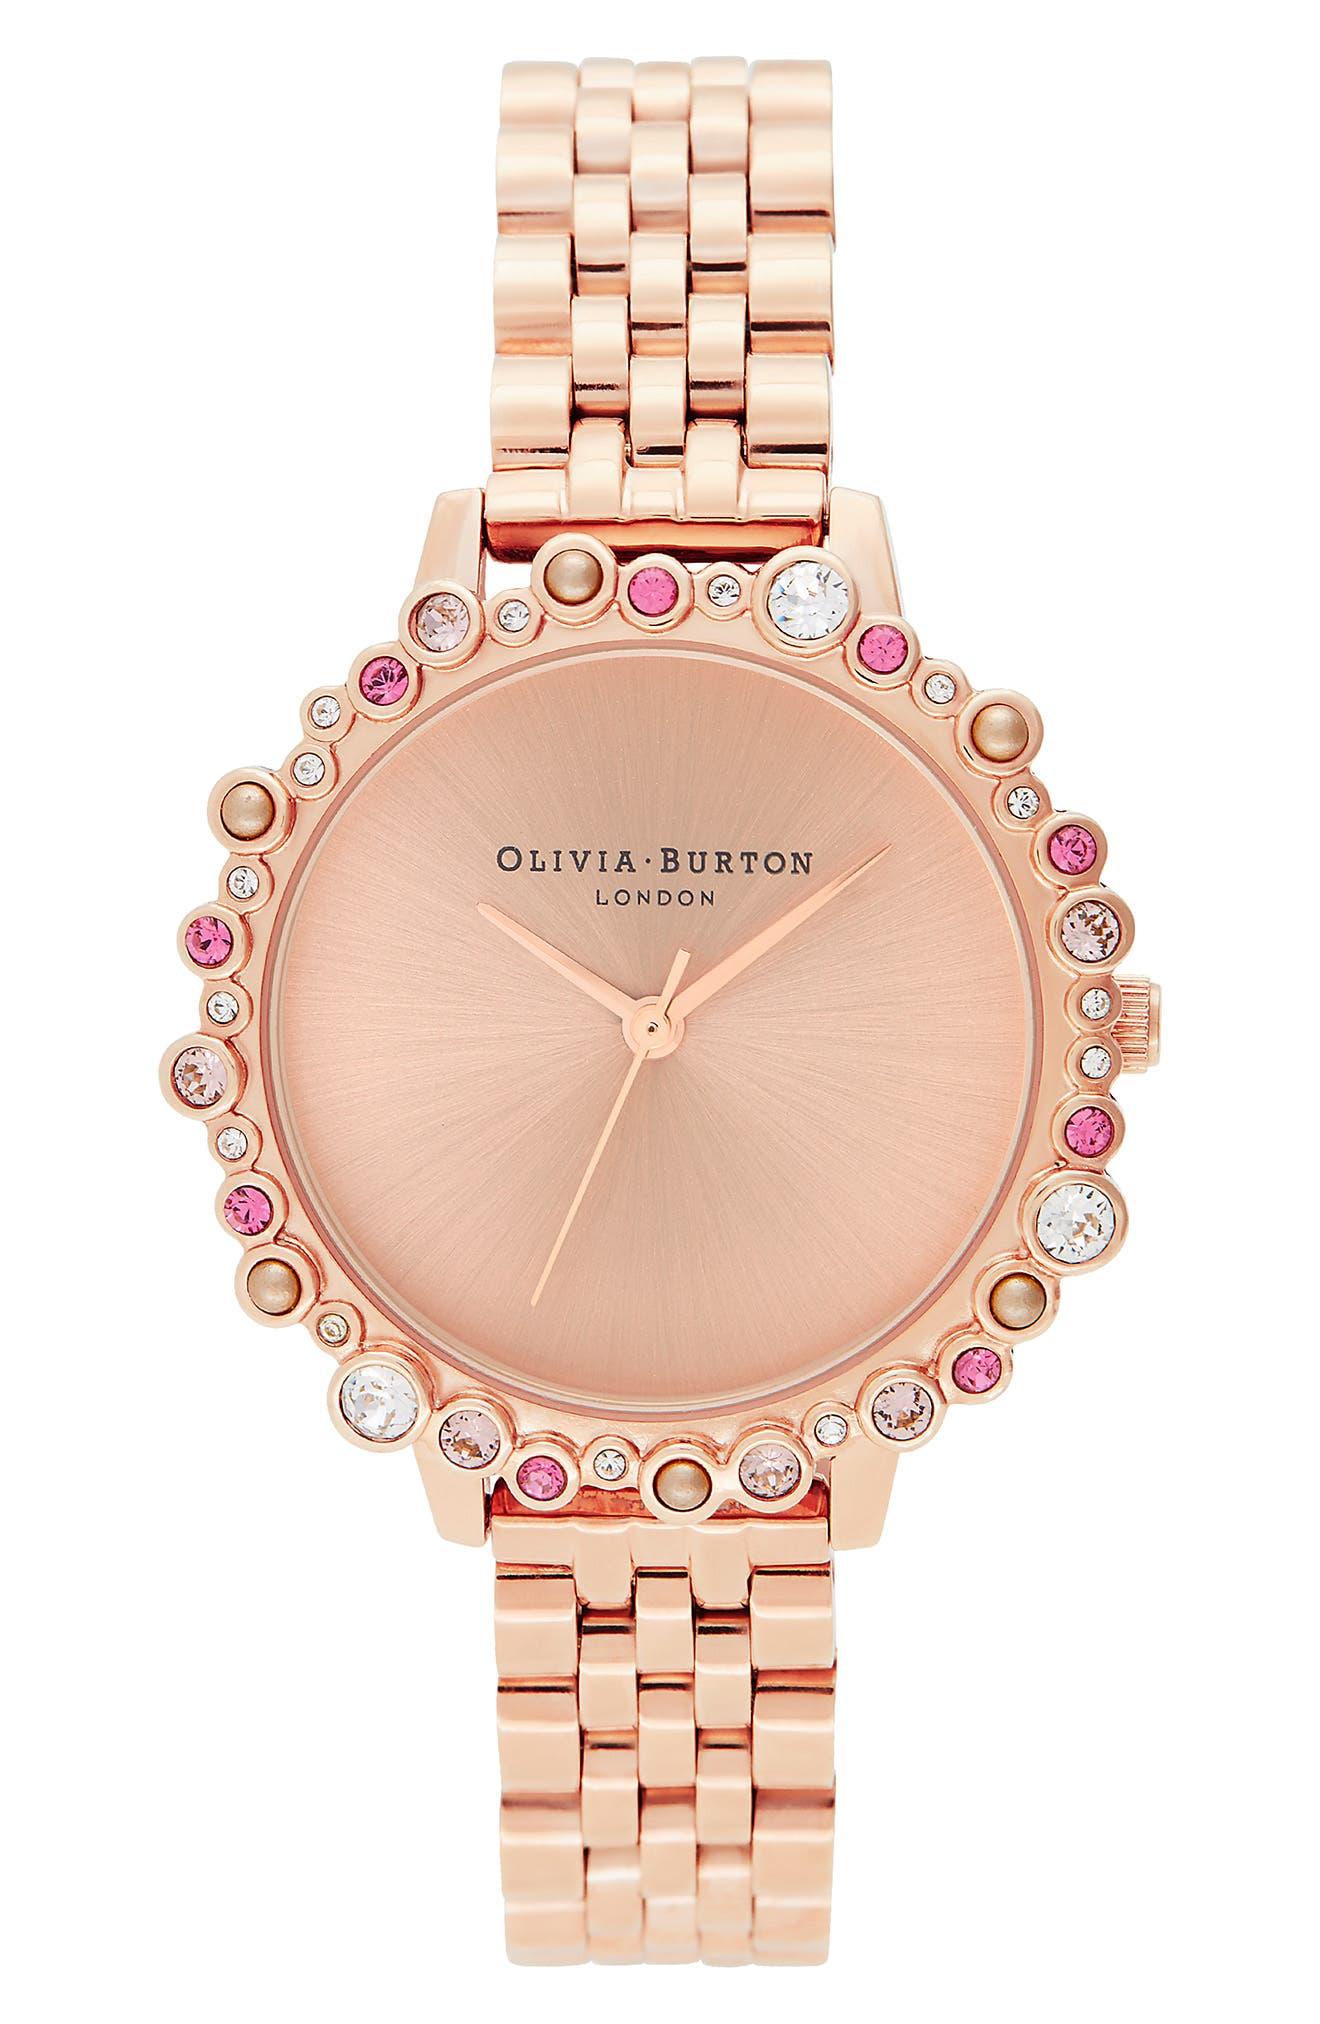 Image of OLIVIA BURTON Women's Limited Edition Swarovski Crystal Bracelet Watch, 30mm